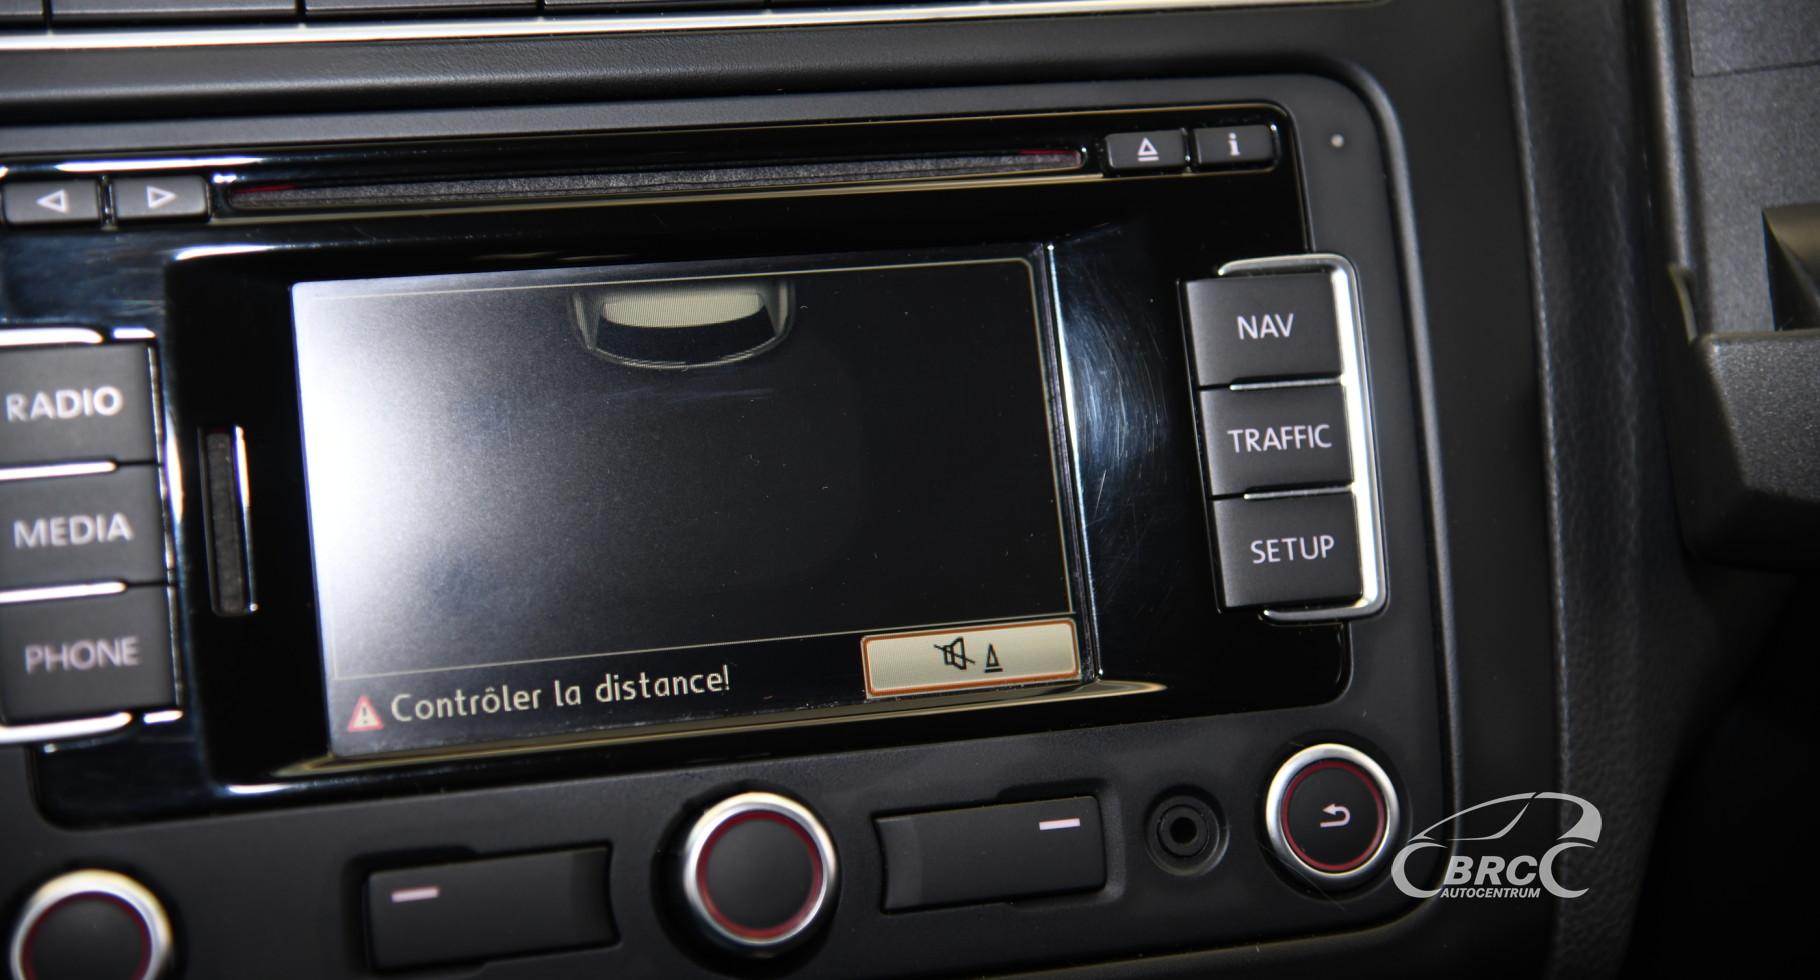 Volkswagen Polo 1.6 TDI Automatas